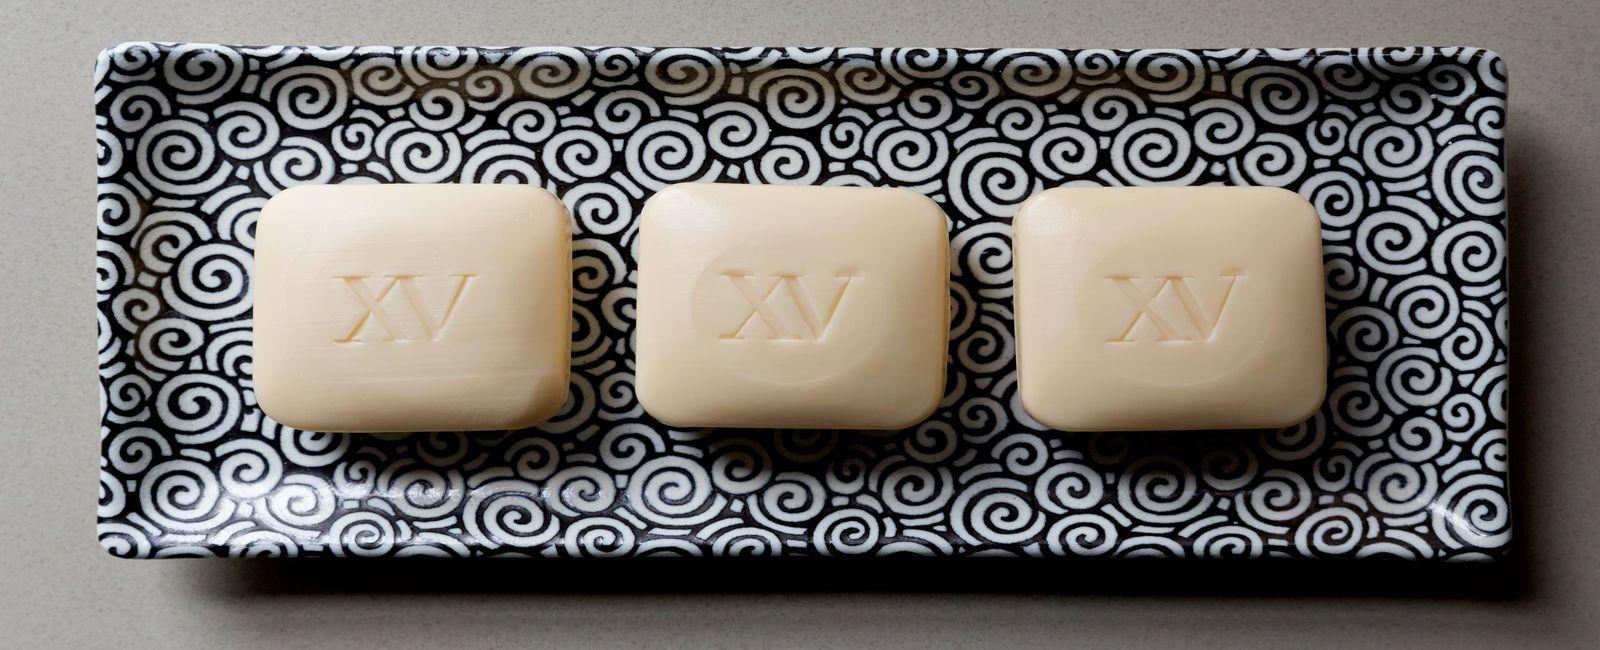 fifteen beacon branded soap bars.